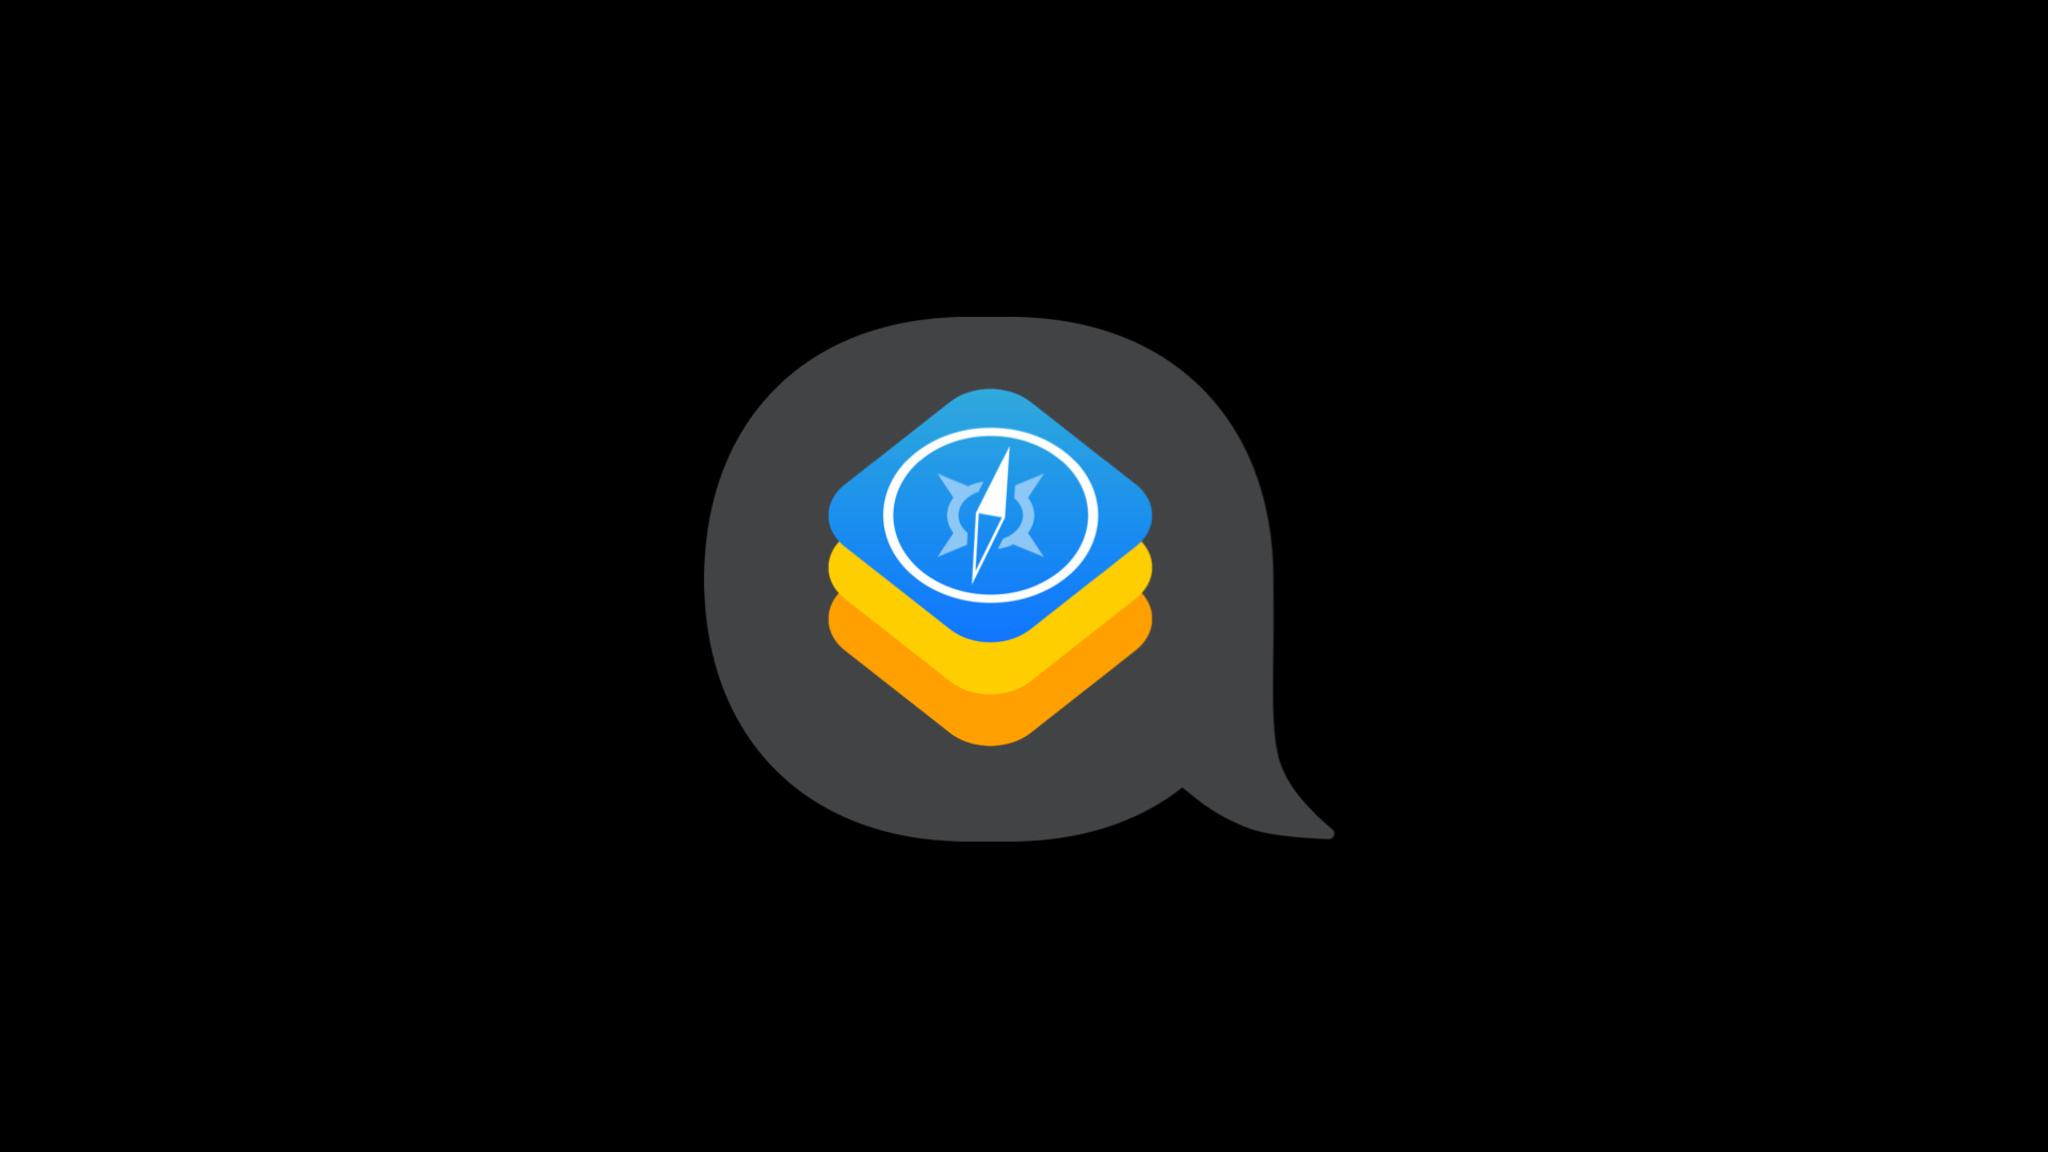 Safaria compass icon  inside of a speech bubble.